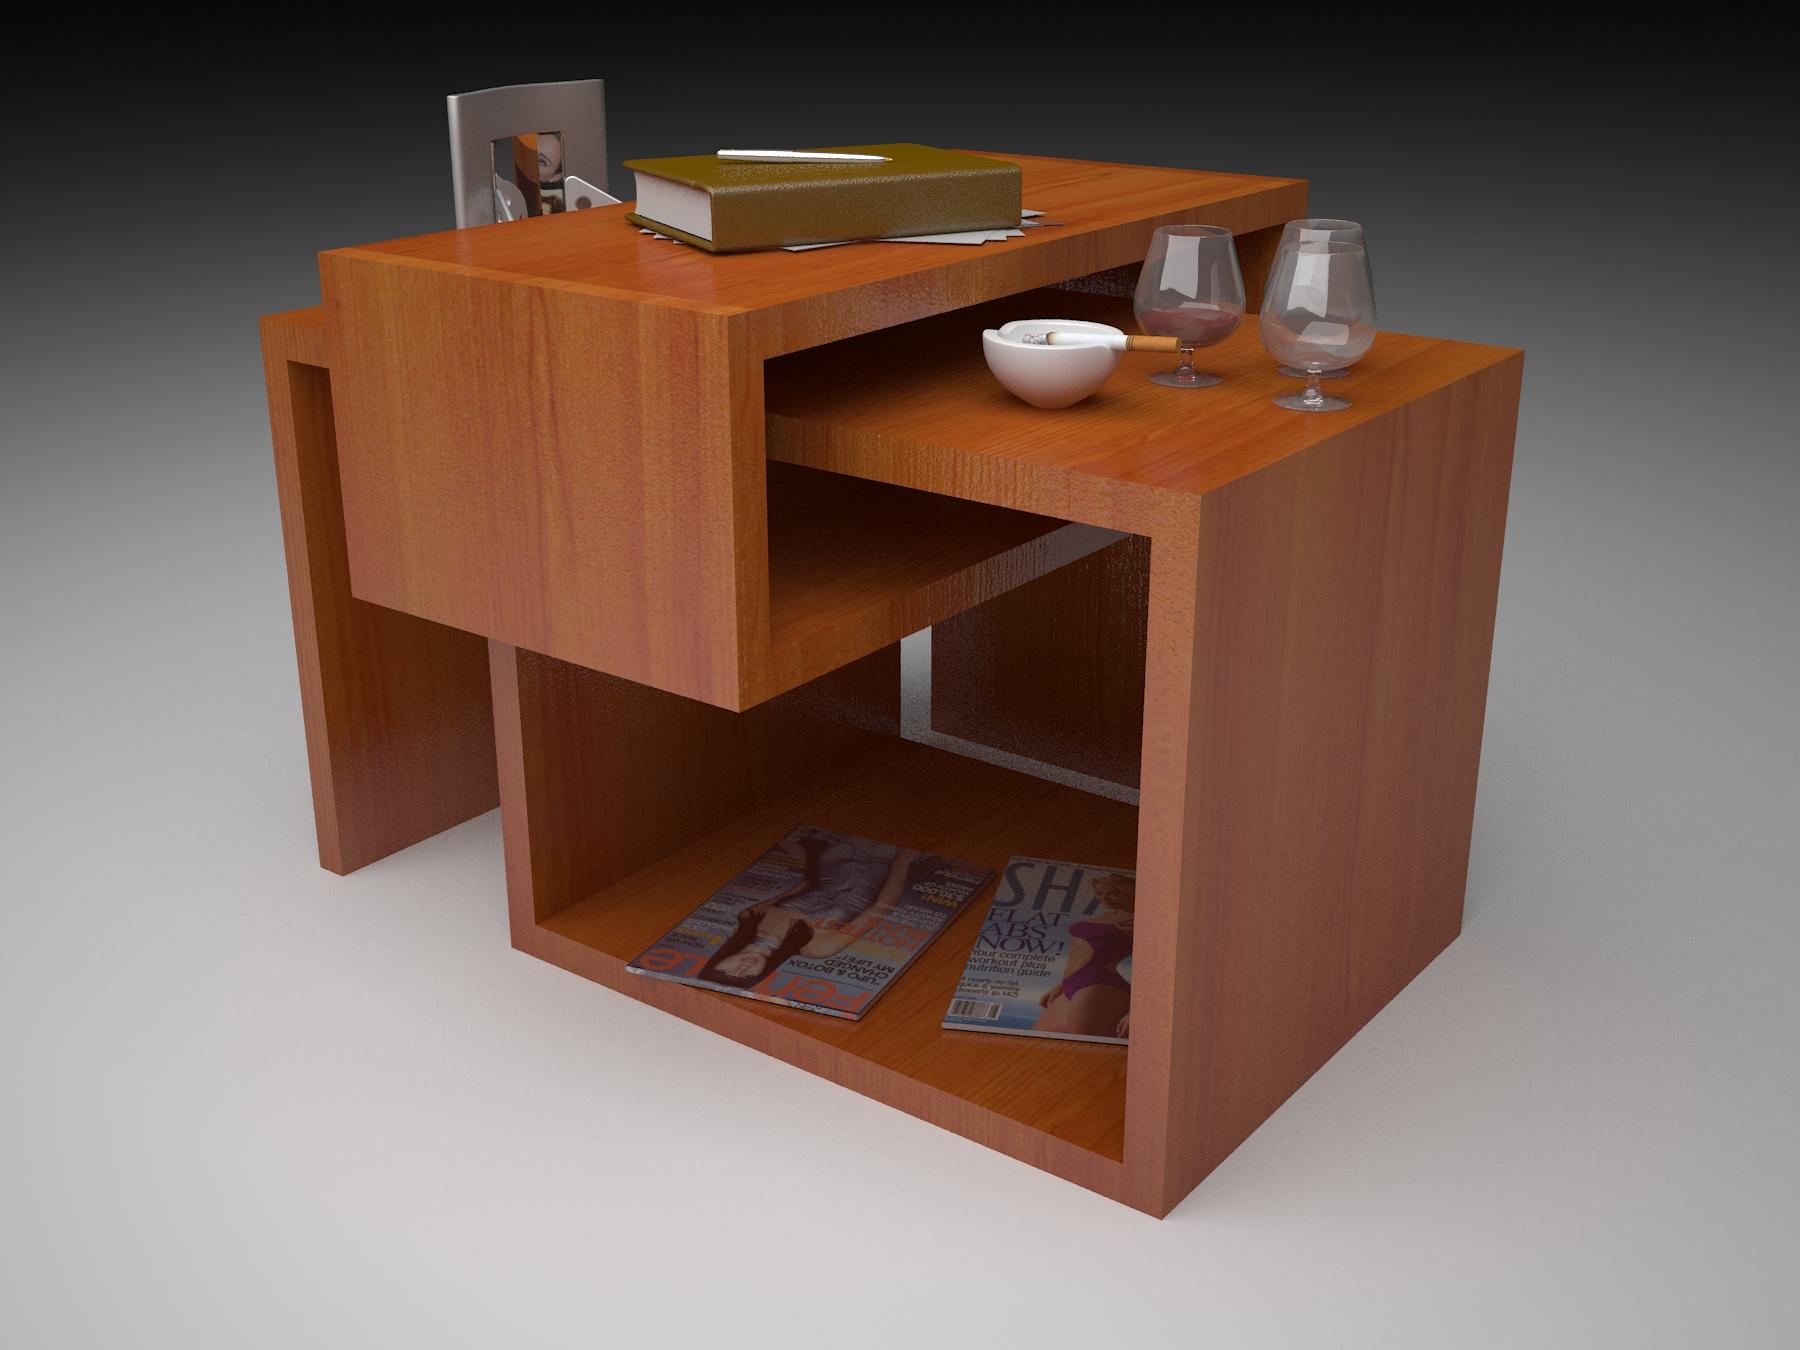 Diseñar mobiliarios a tu gusto en Revit - Arquitectura BIM